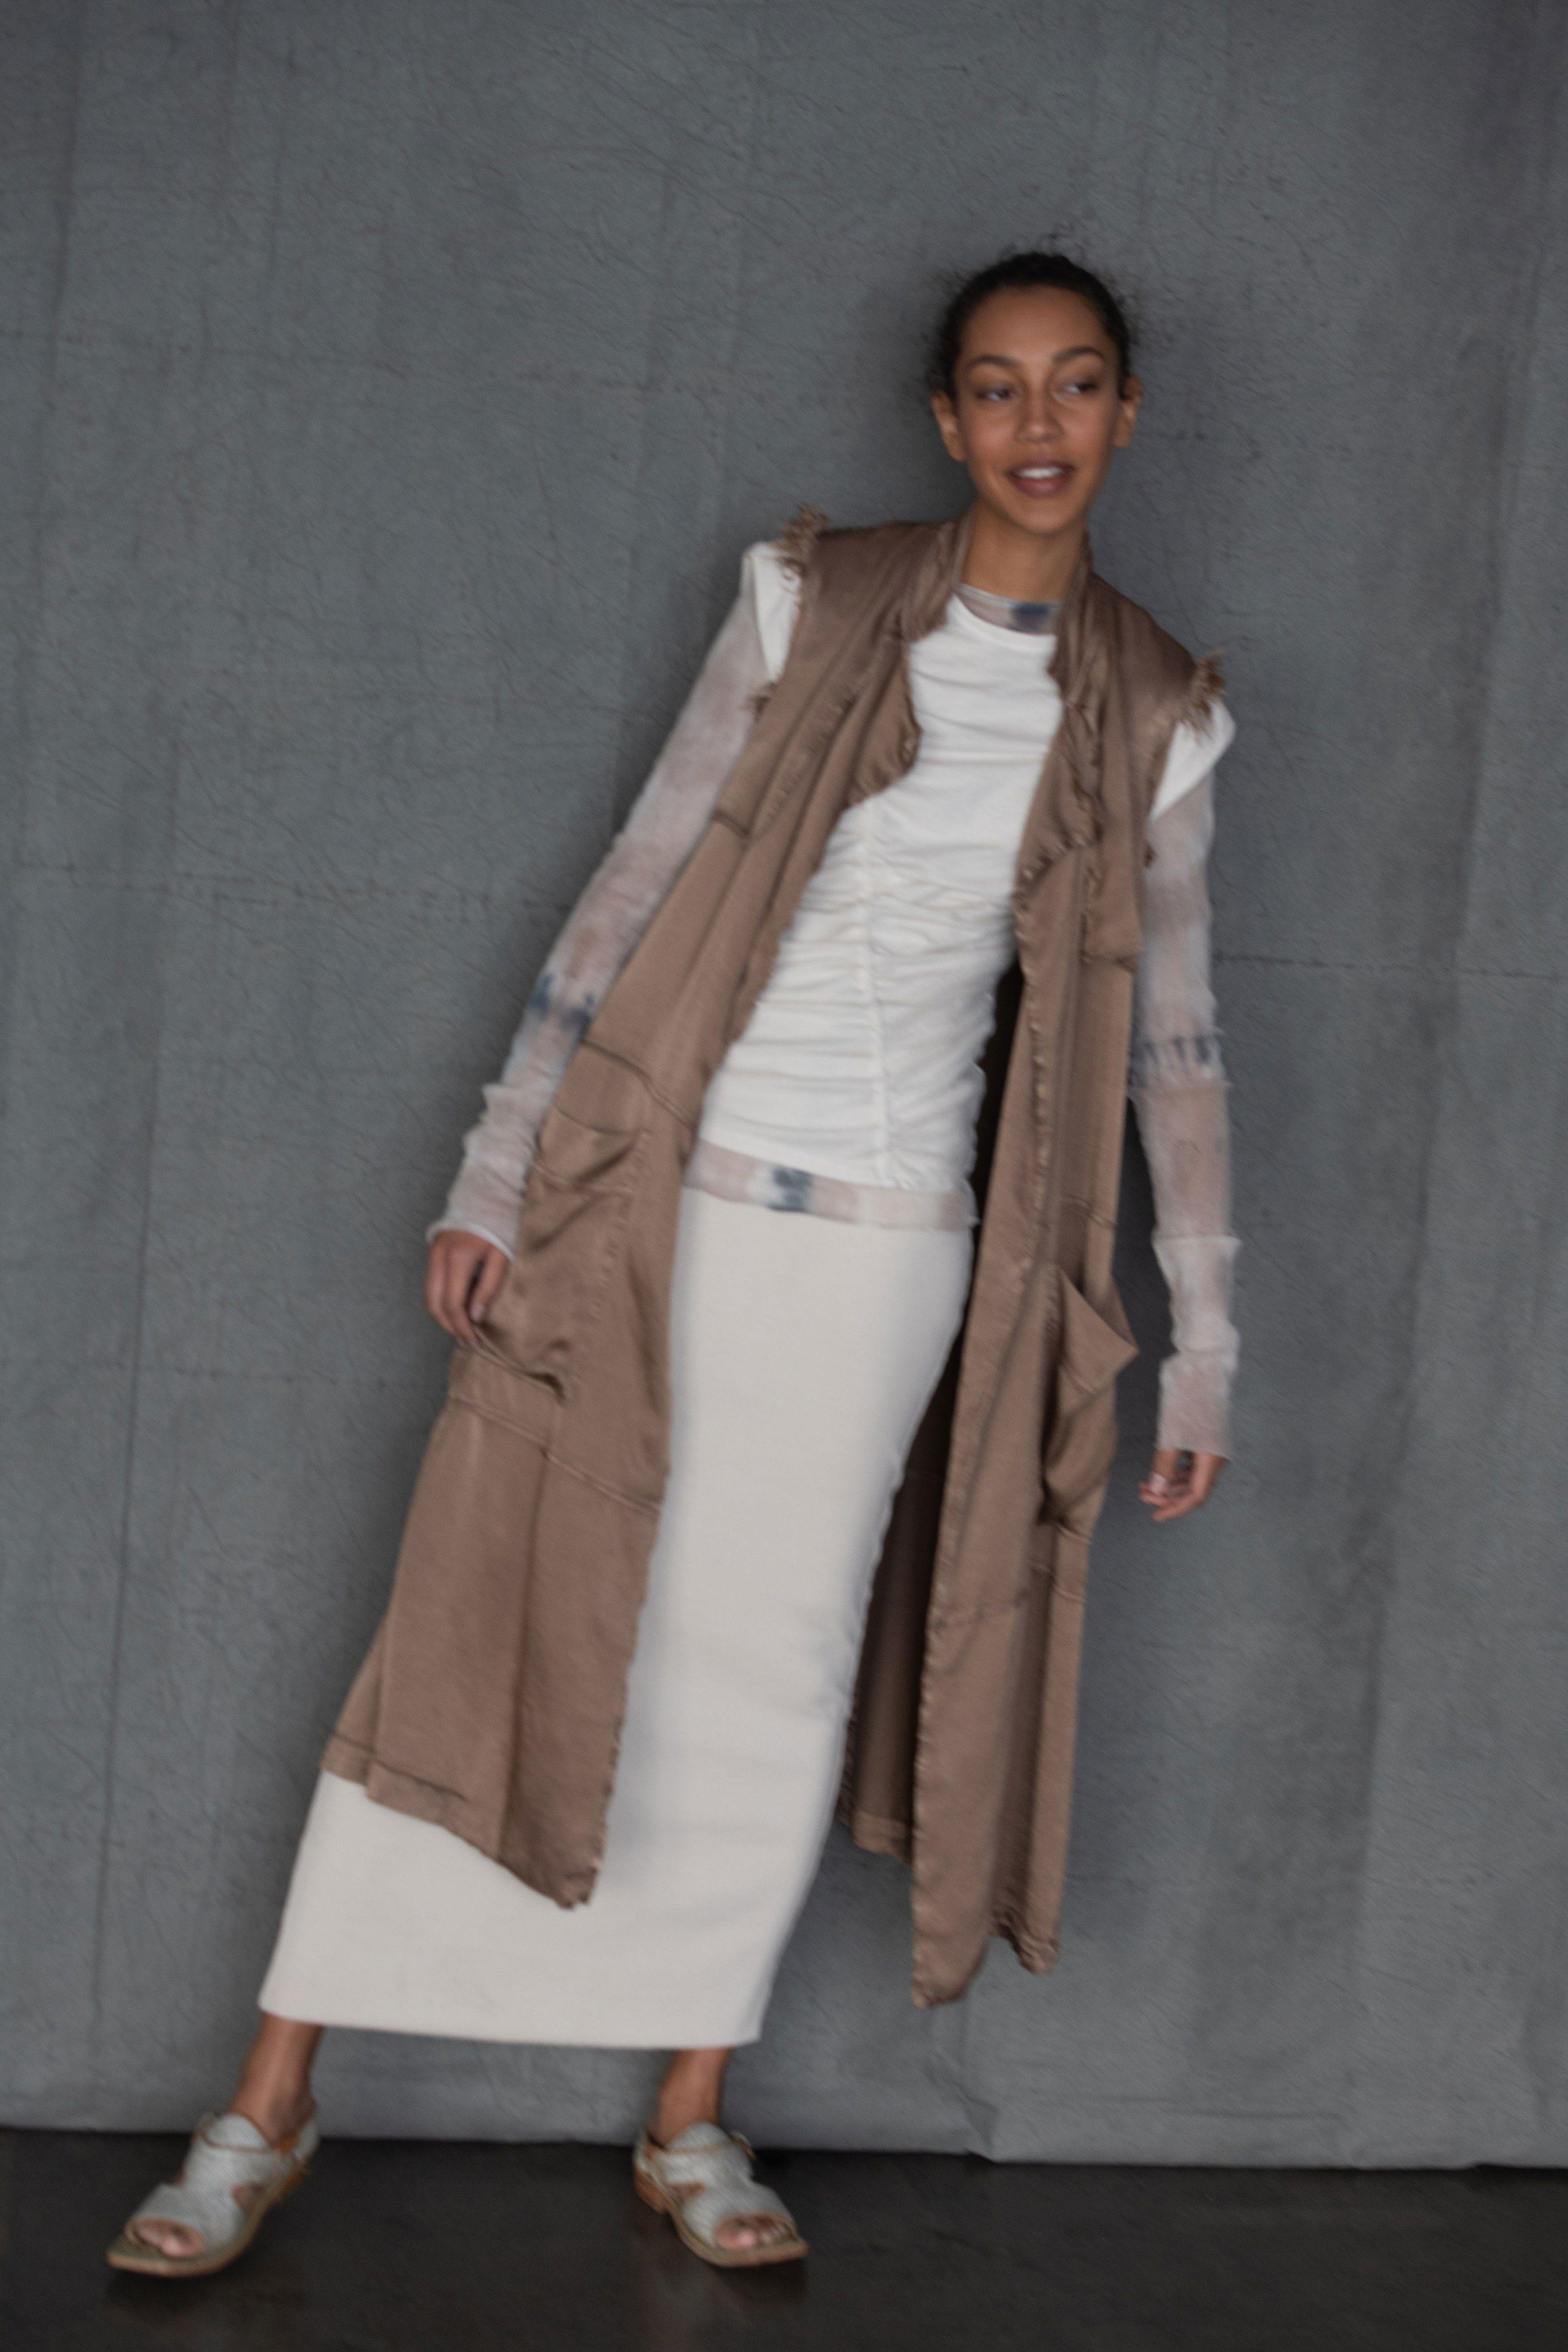 99c9b4fad9c6 Raquel Allegra Pre-Fall 2019 Fashion Show | Fashion shows - Pre-Fall ...